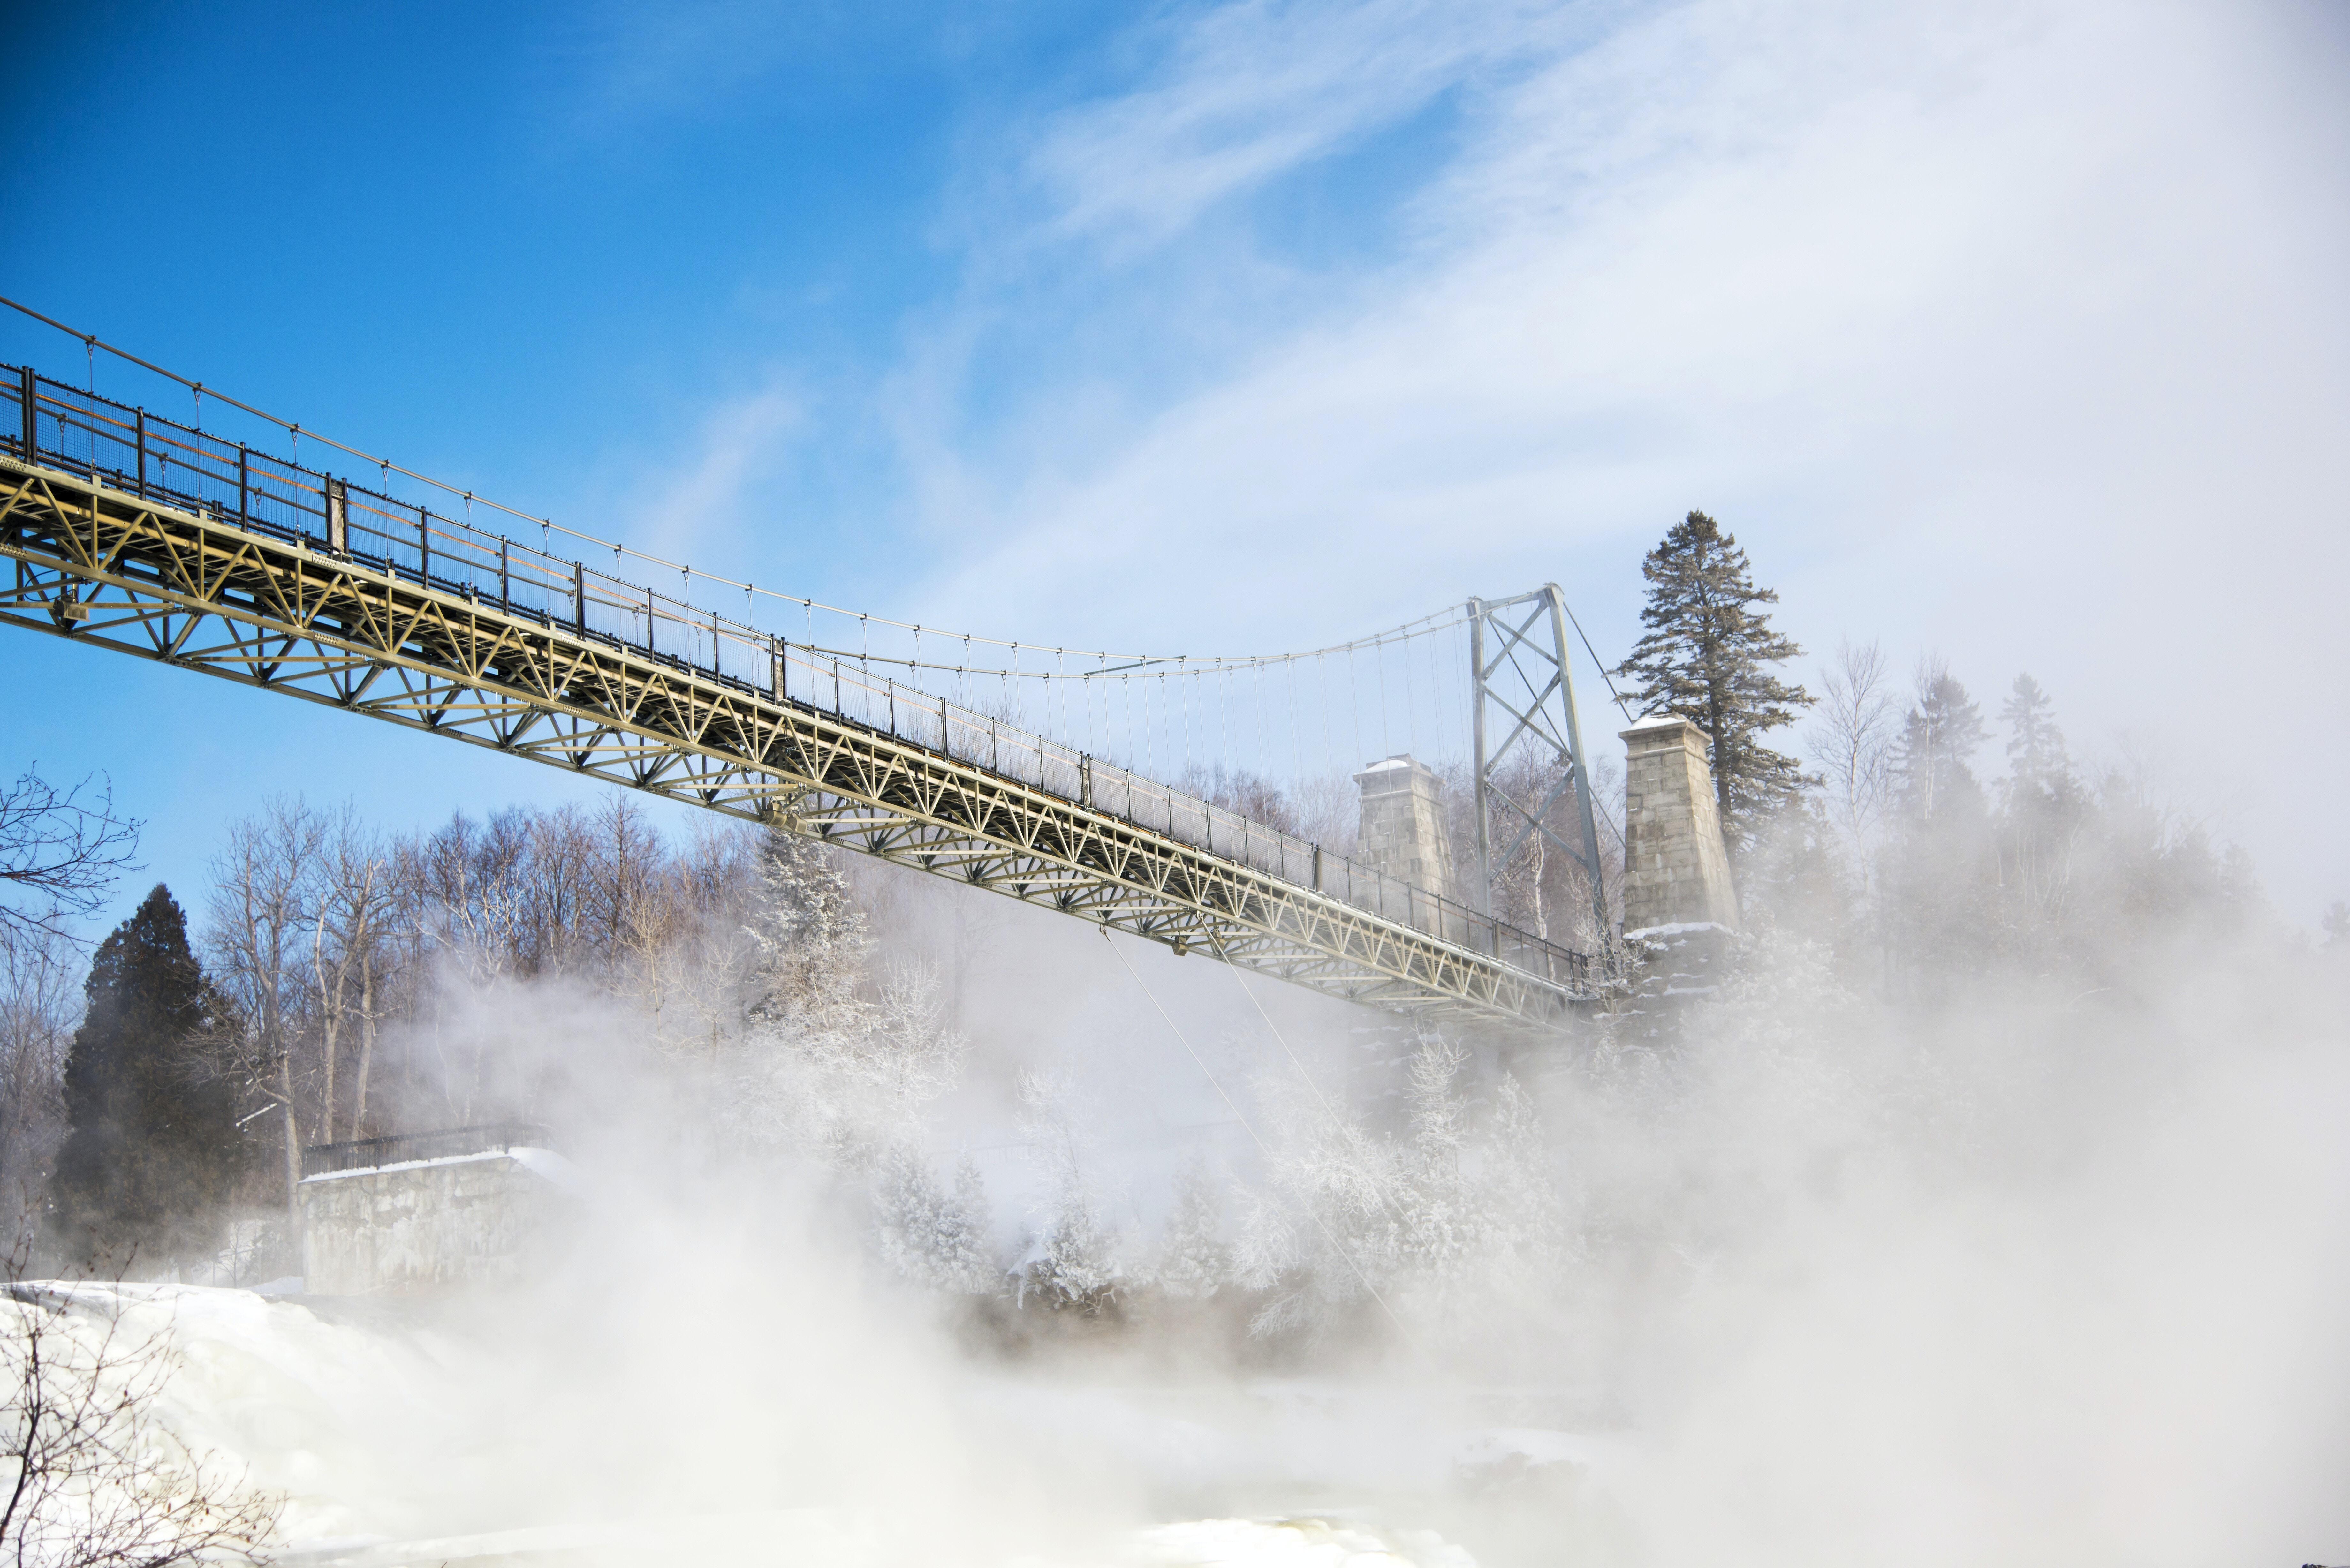 Bridge overpass in a snowy winterscape in Montmorency Falls